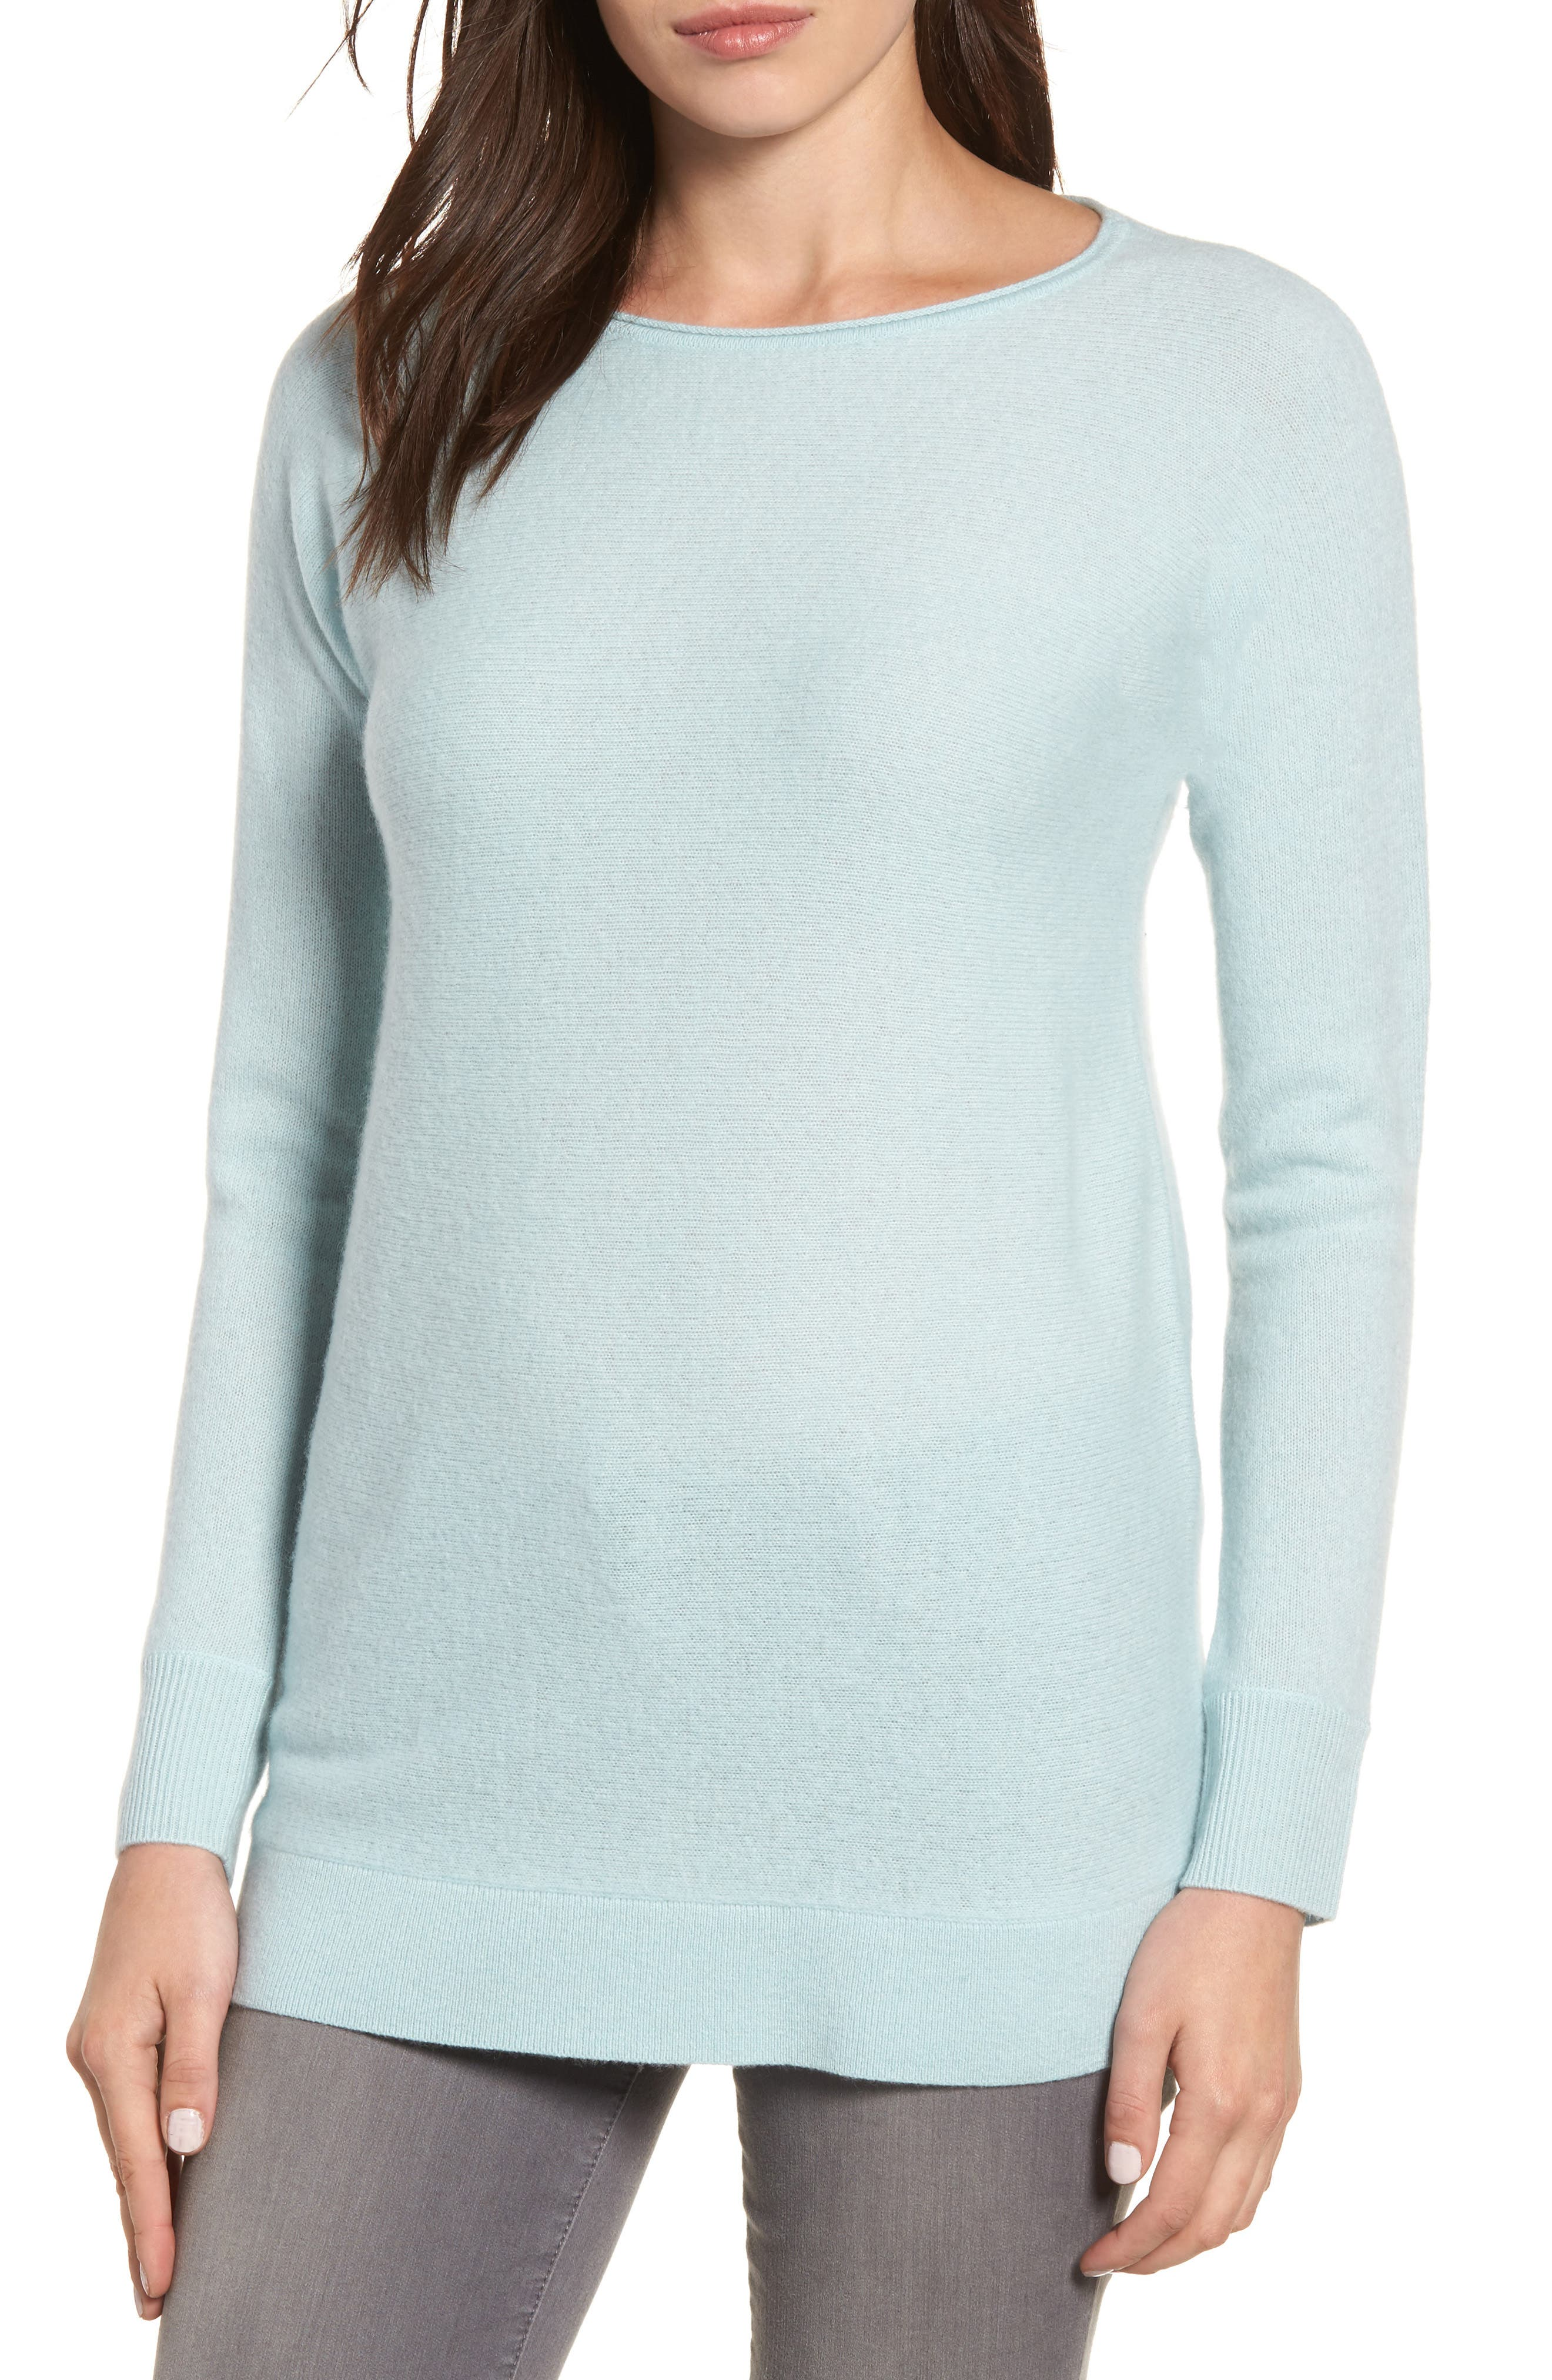 Main Image - Halogen® High/Low Wool & Cashmere Tunic Sweater (Regular & Petite)